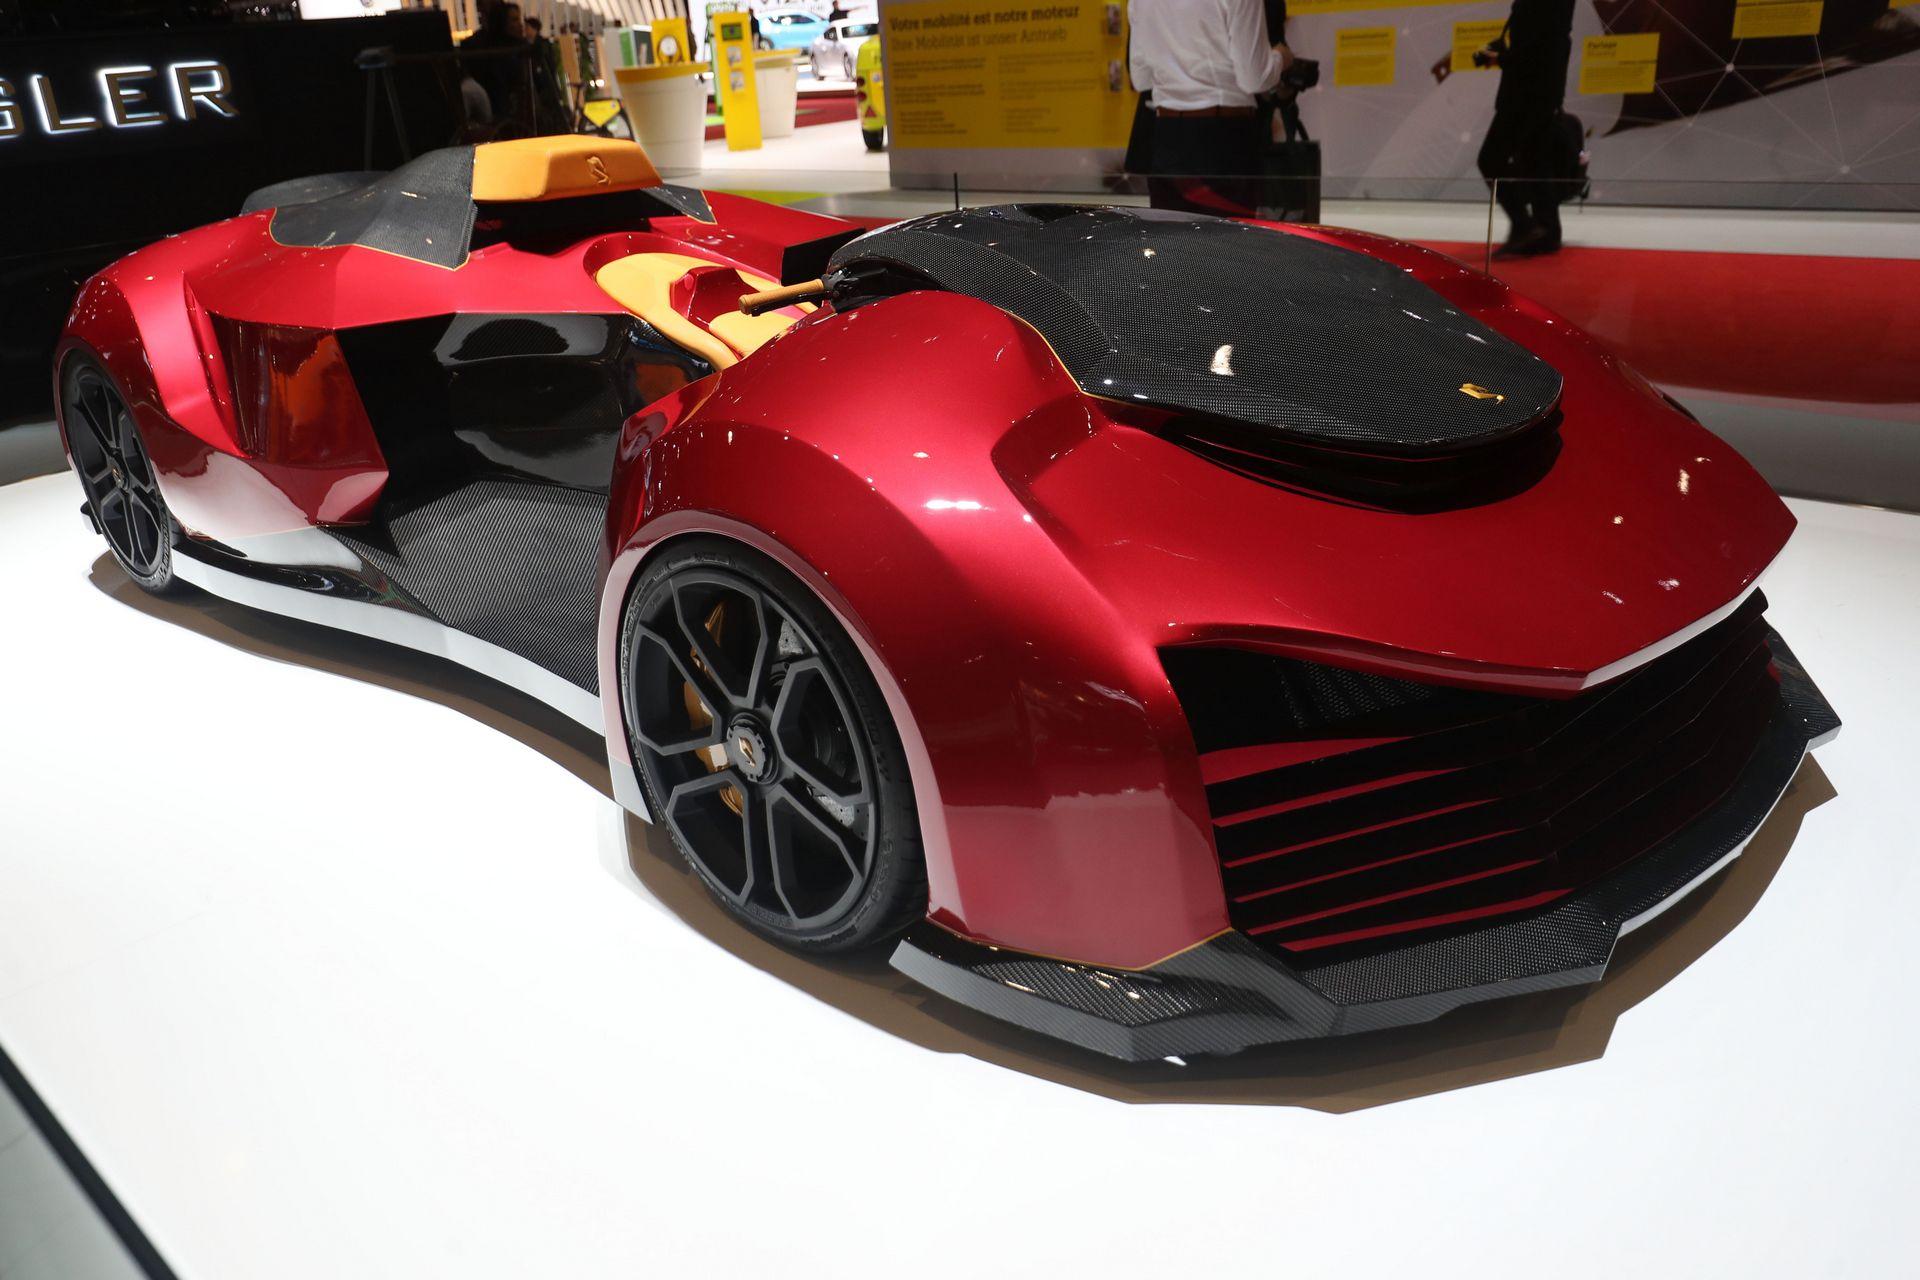 Engler Automotive Superquad